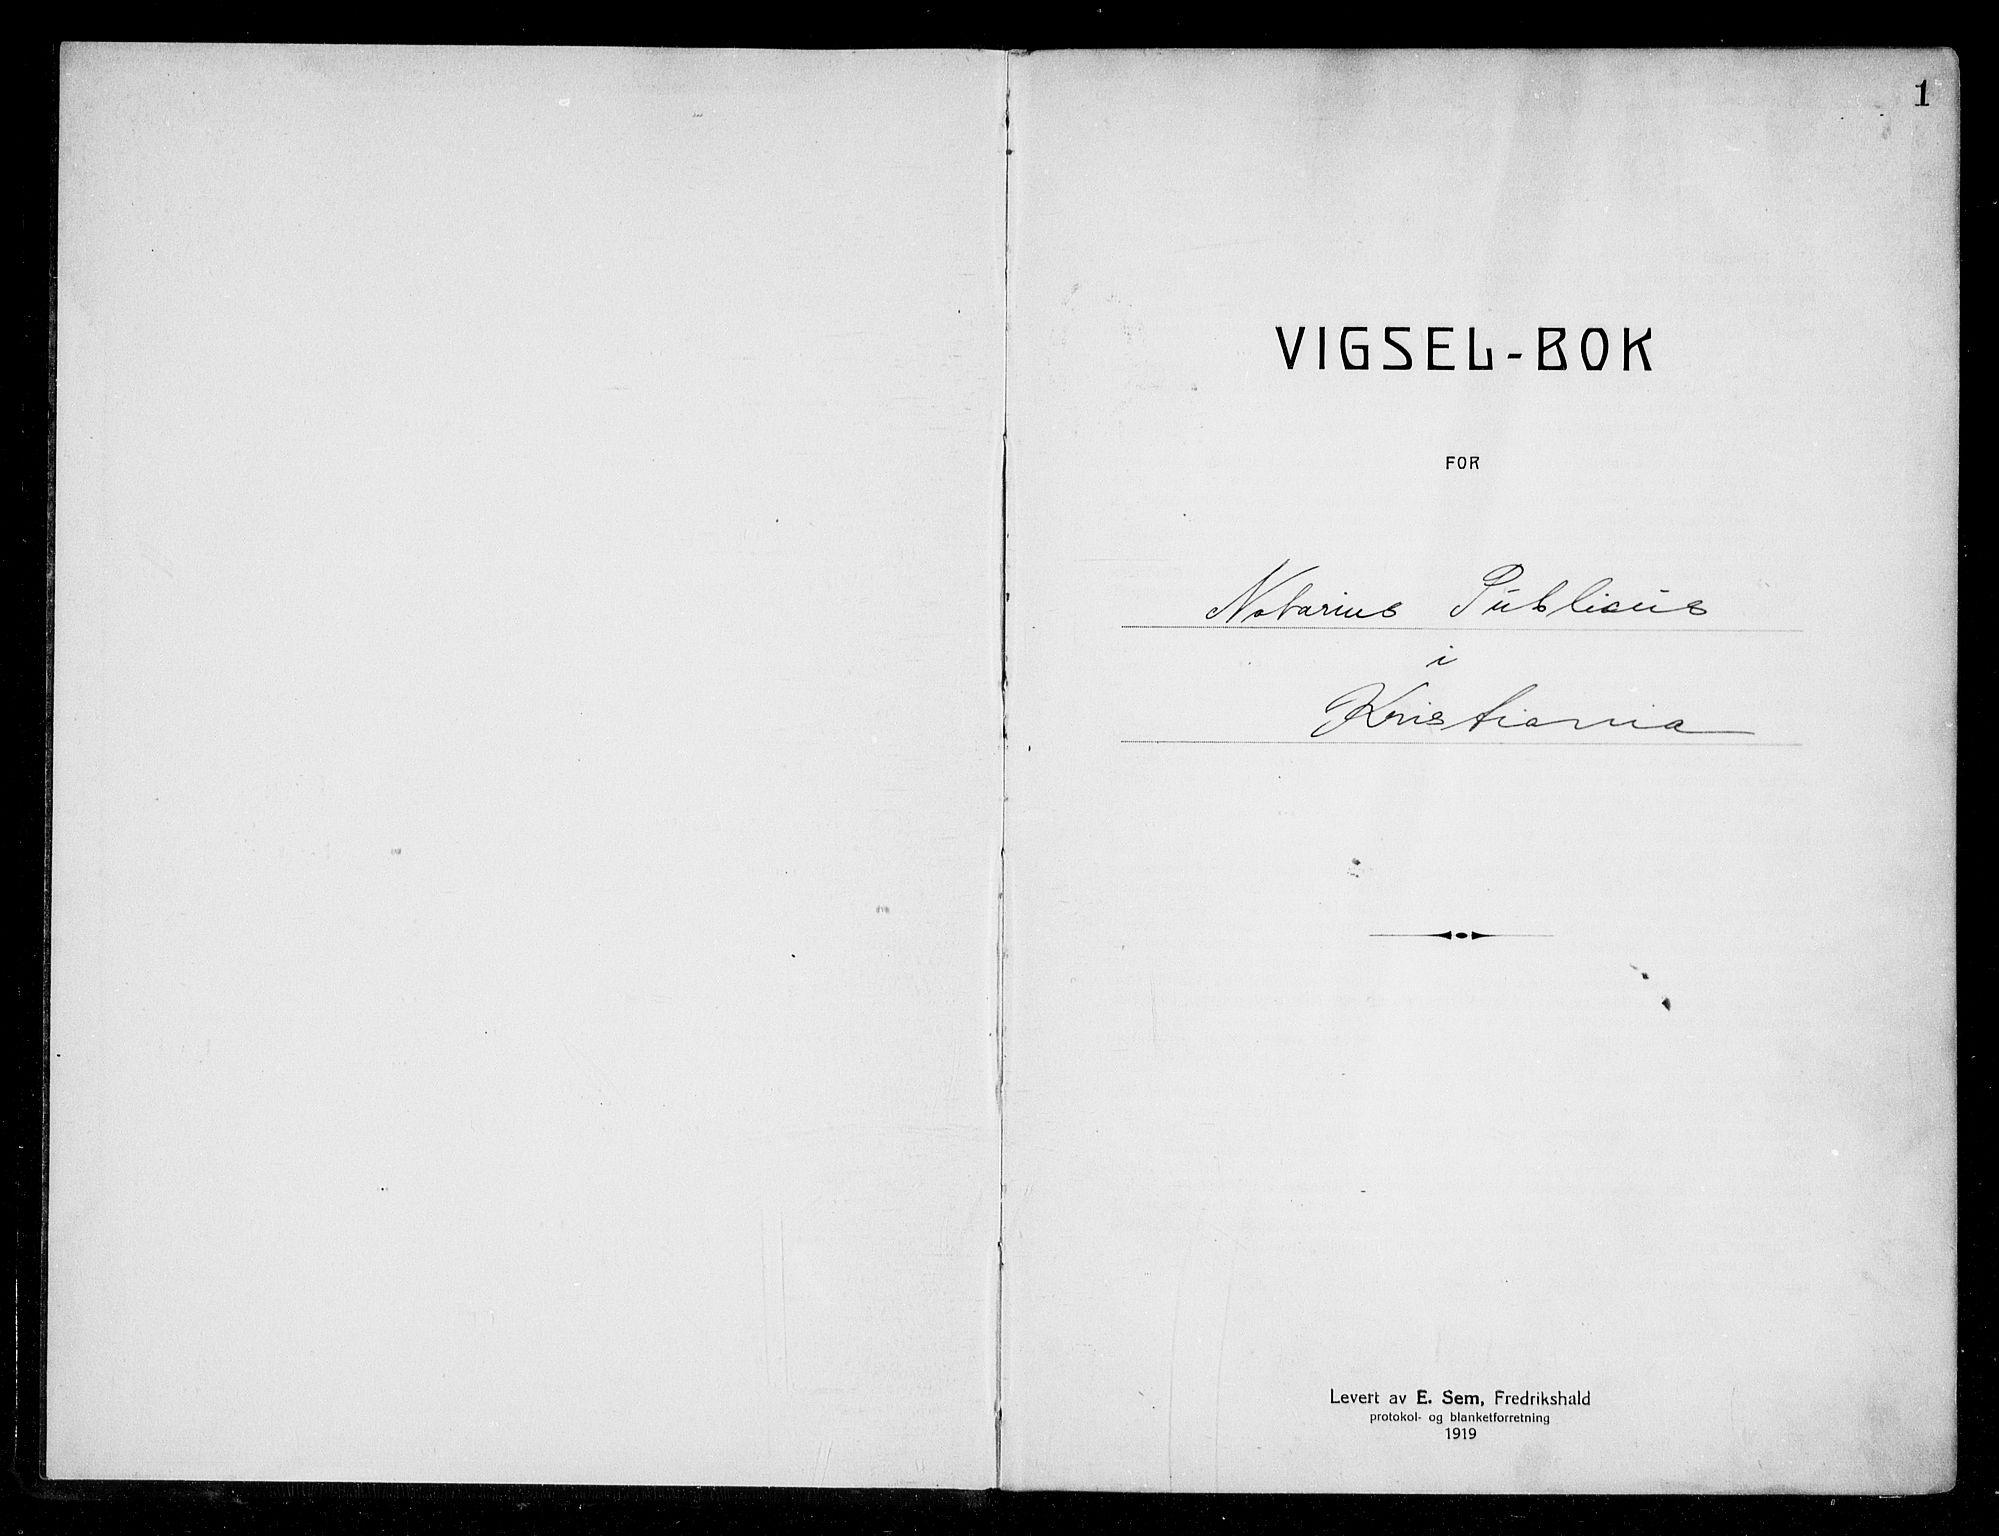 SAO, Oslo byfogd avd. I, L/Lb/Lbb/L0016: Notarialprotokoll, rekke II: Vigsler, 1922-1924, s. 1a